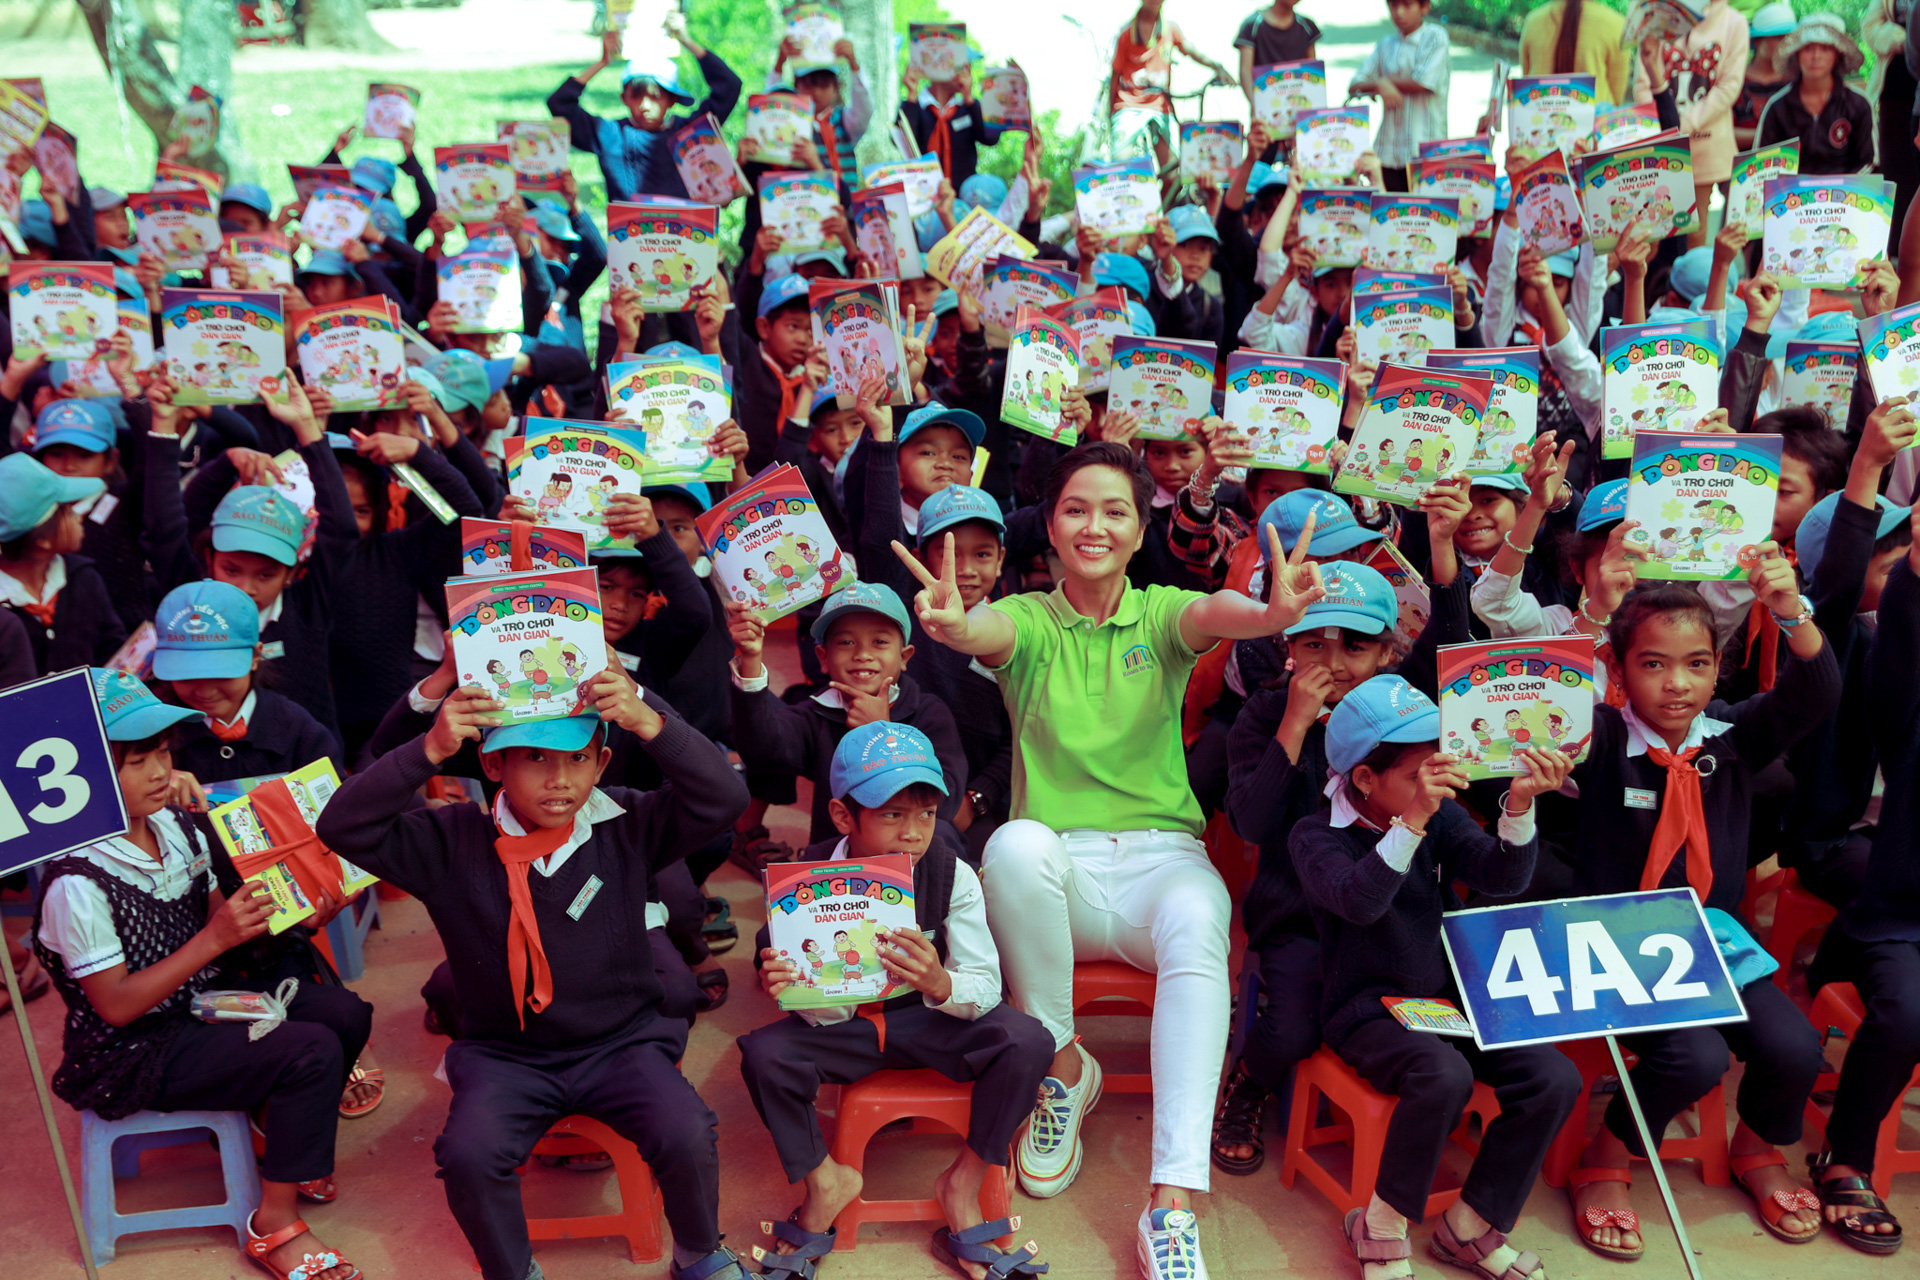 Hoa hau HHen Nie_Xay dung thu vien Room To Read tai Lam Dong (13)